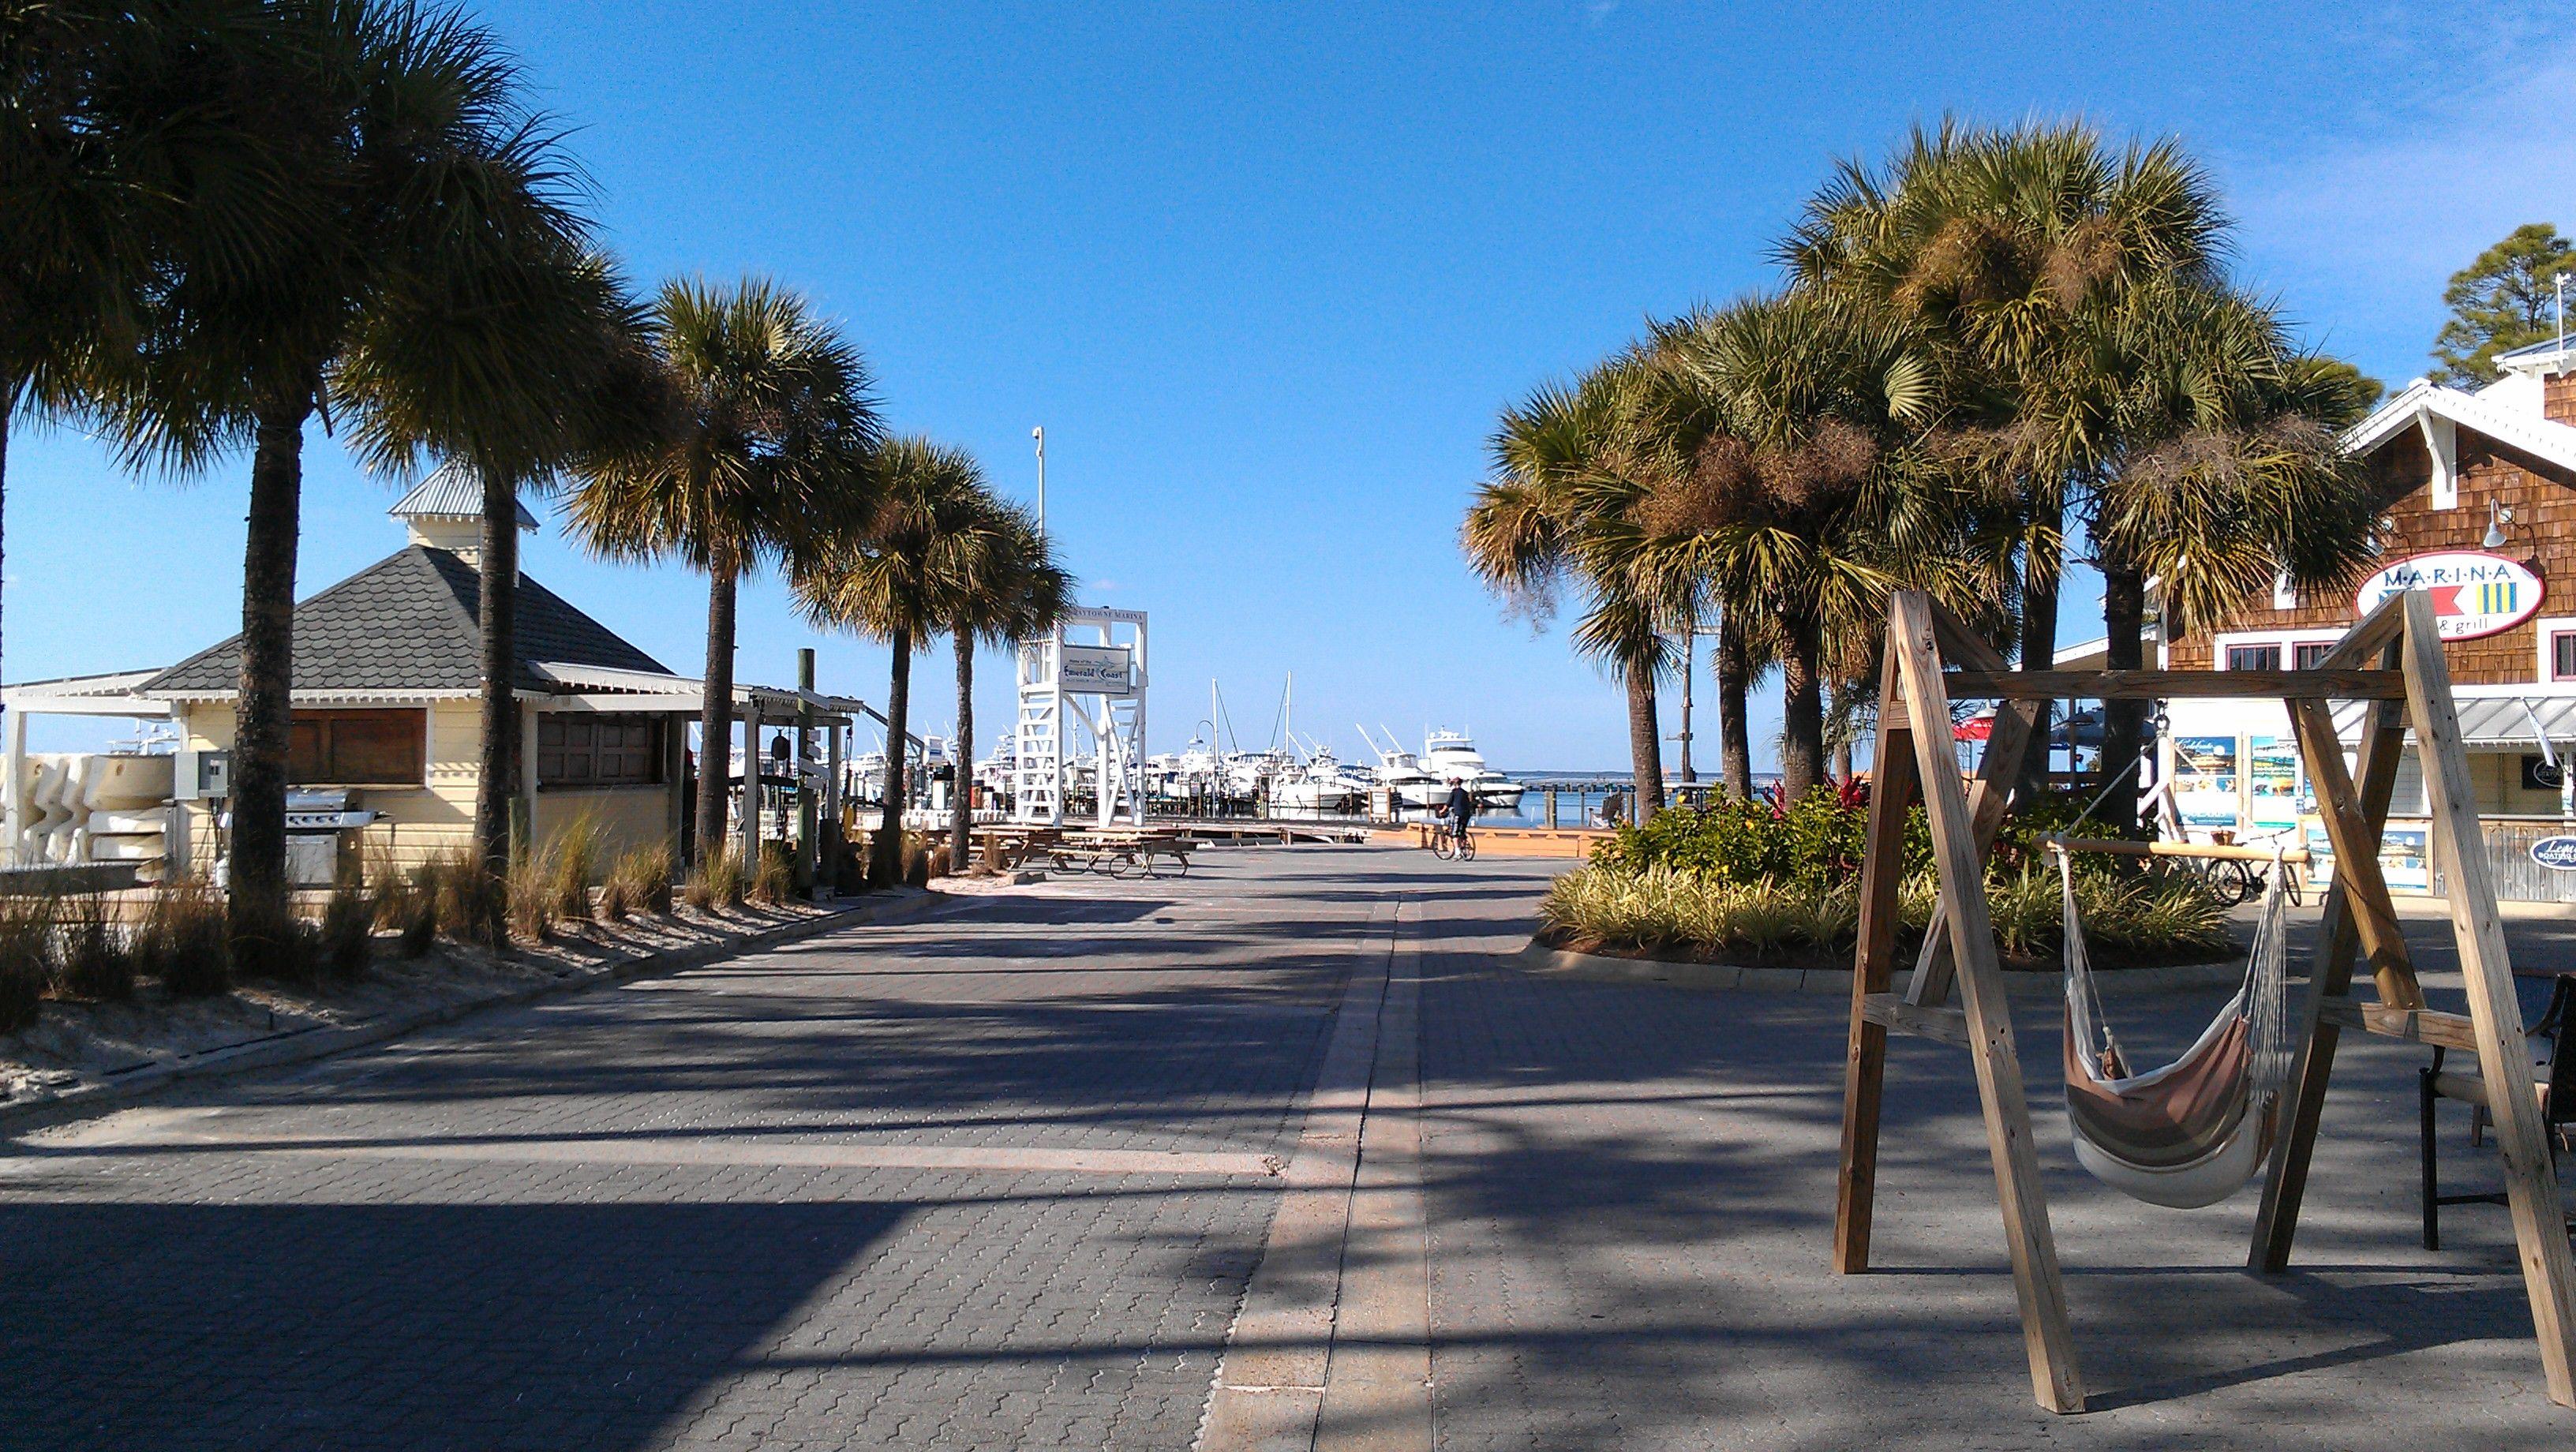 Baytowne Marina Sandestin, FL